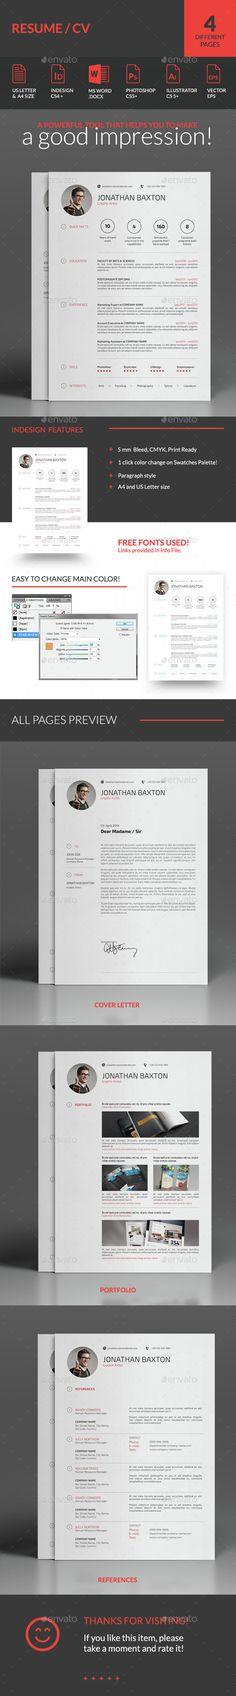 Resume Resume cv - clean resume format